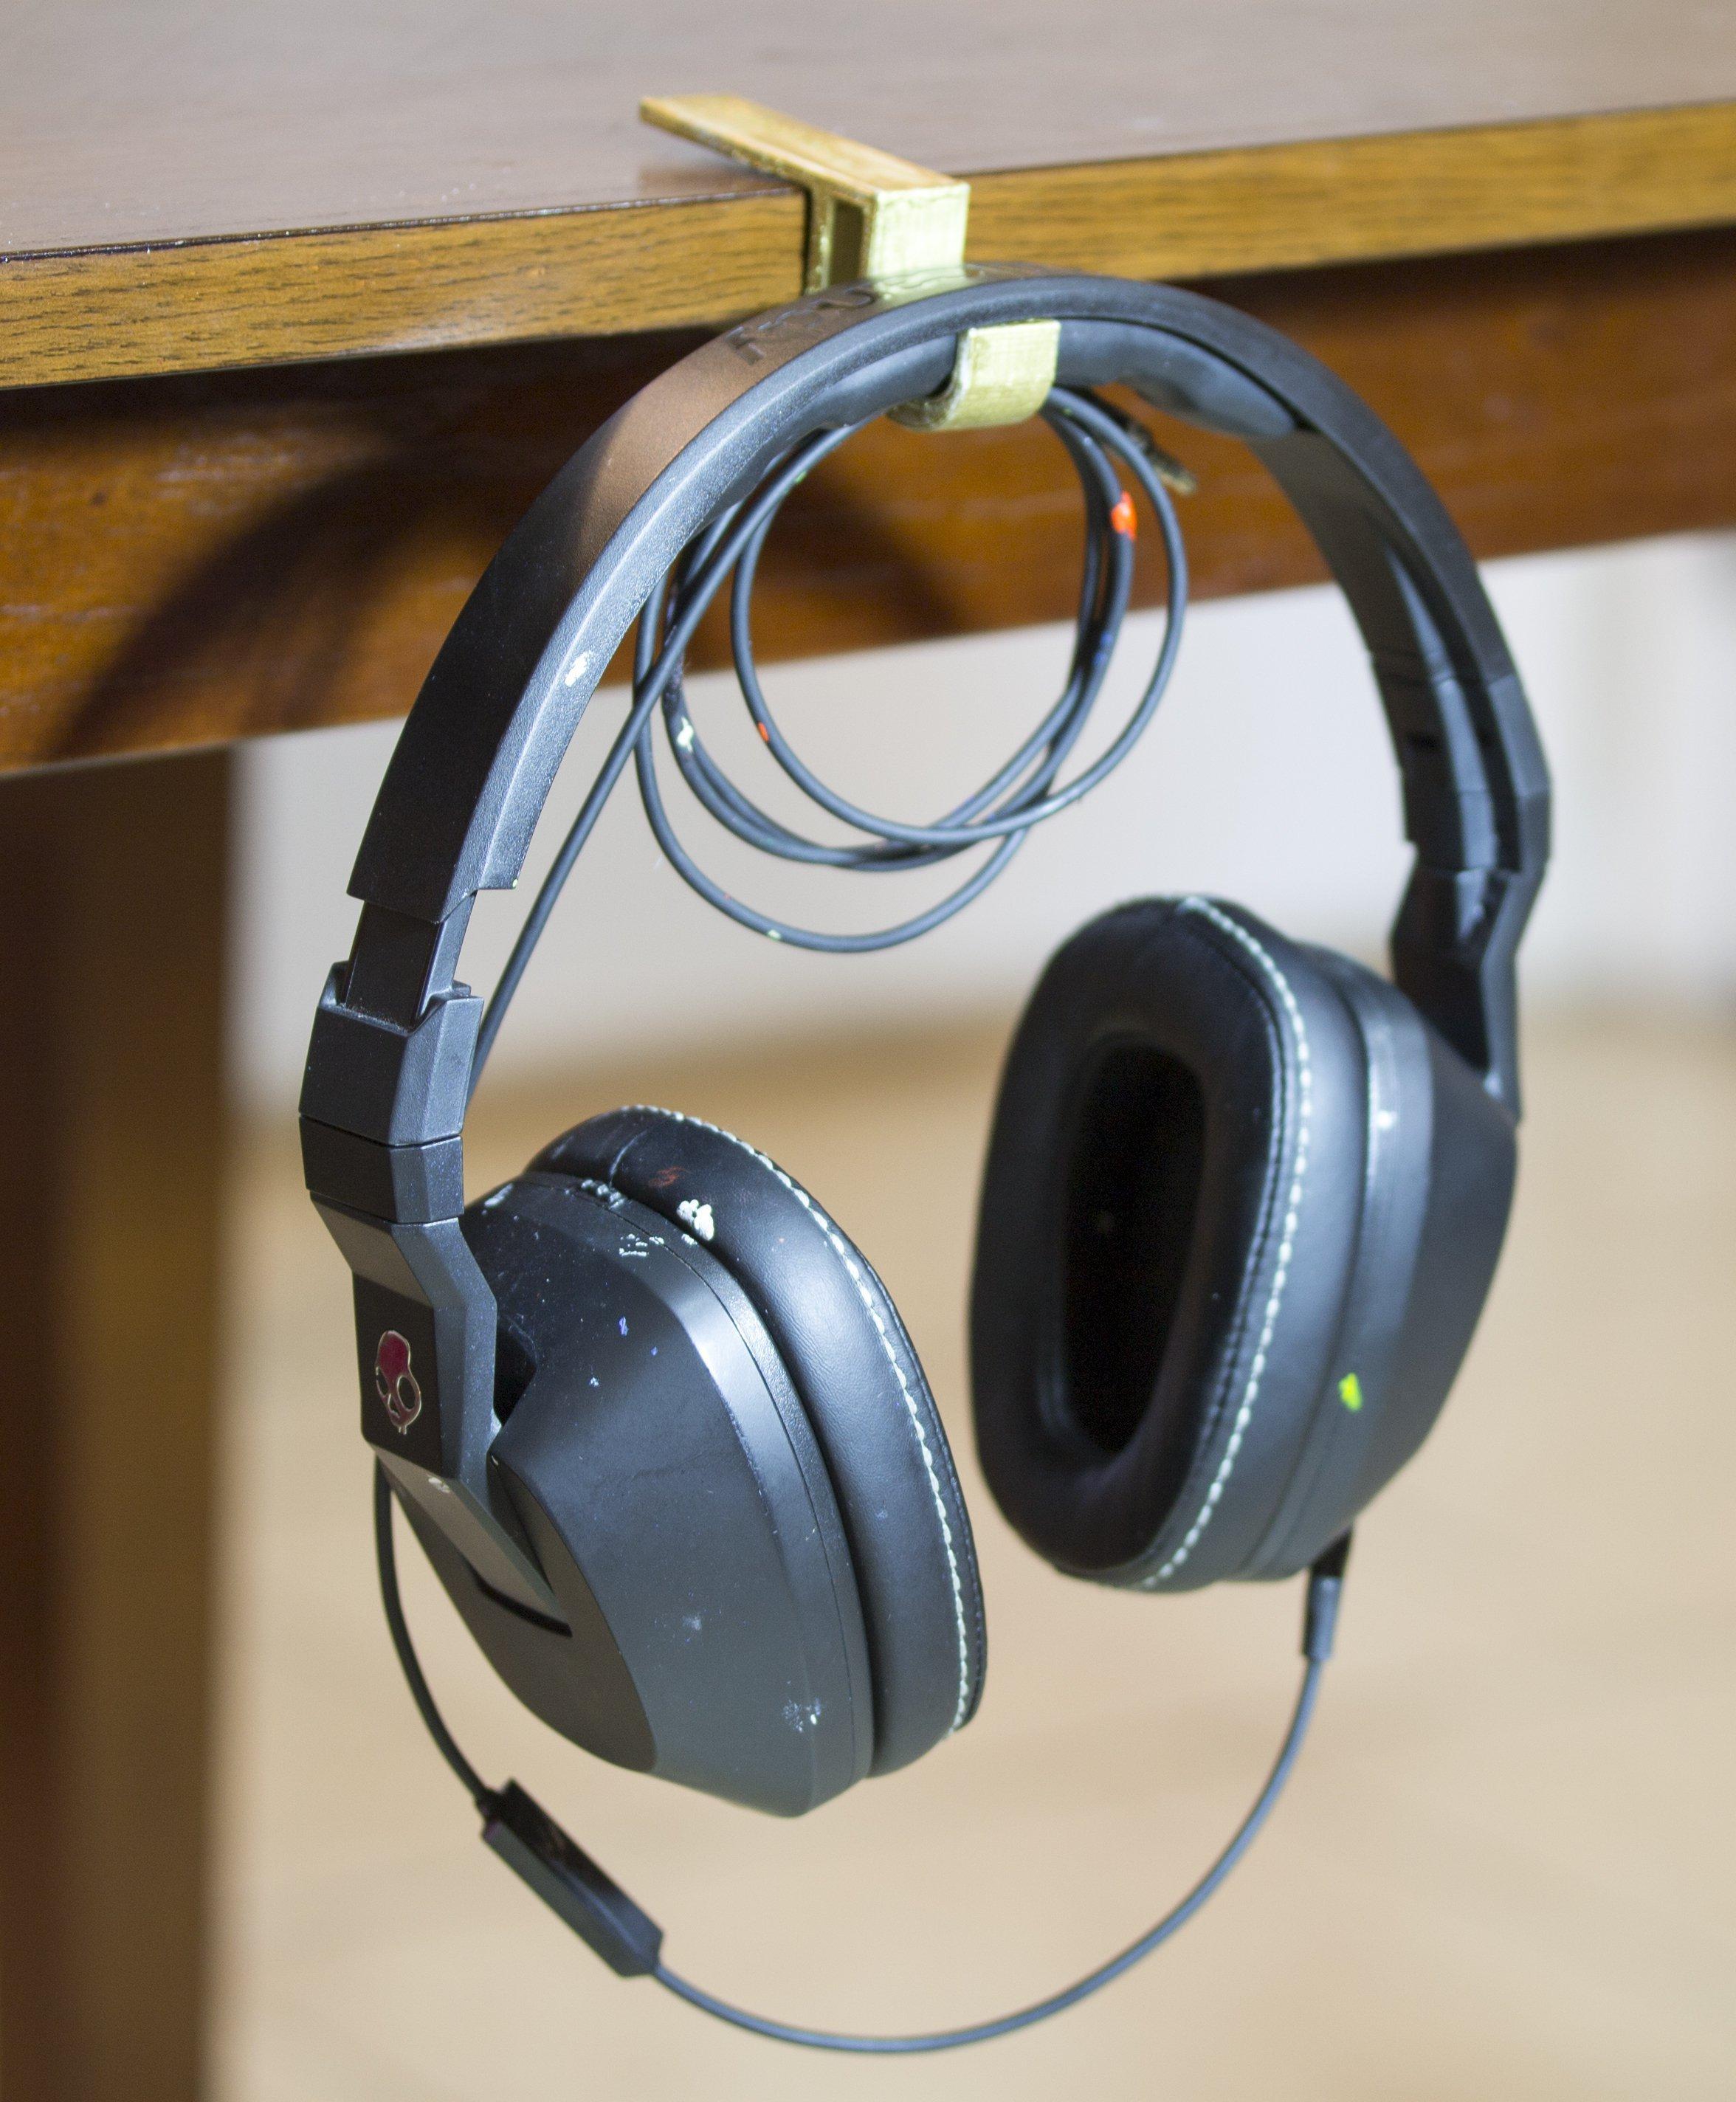 95bf638e9df 3D Printed Desk Headphone Holders by Conceptus3D | Pinshape